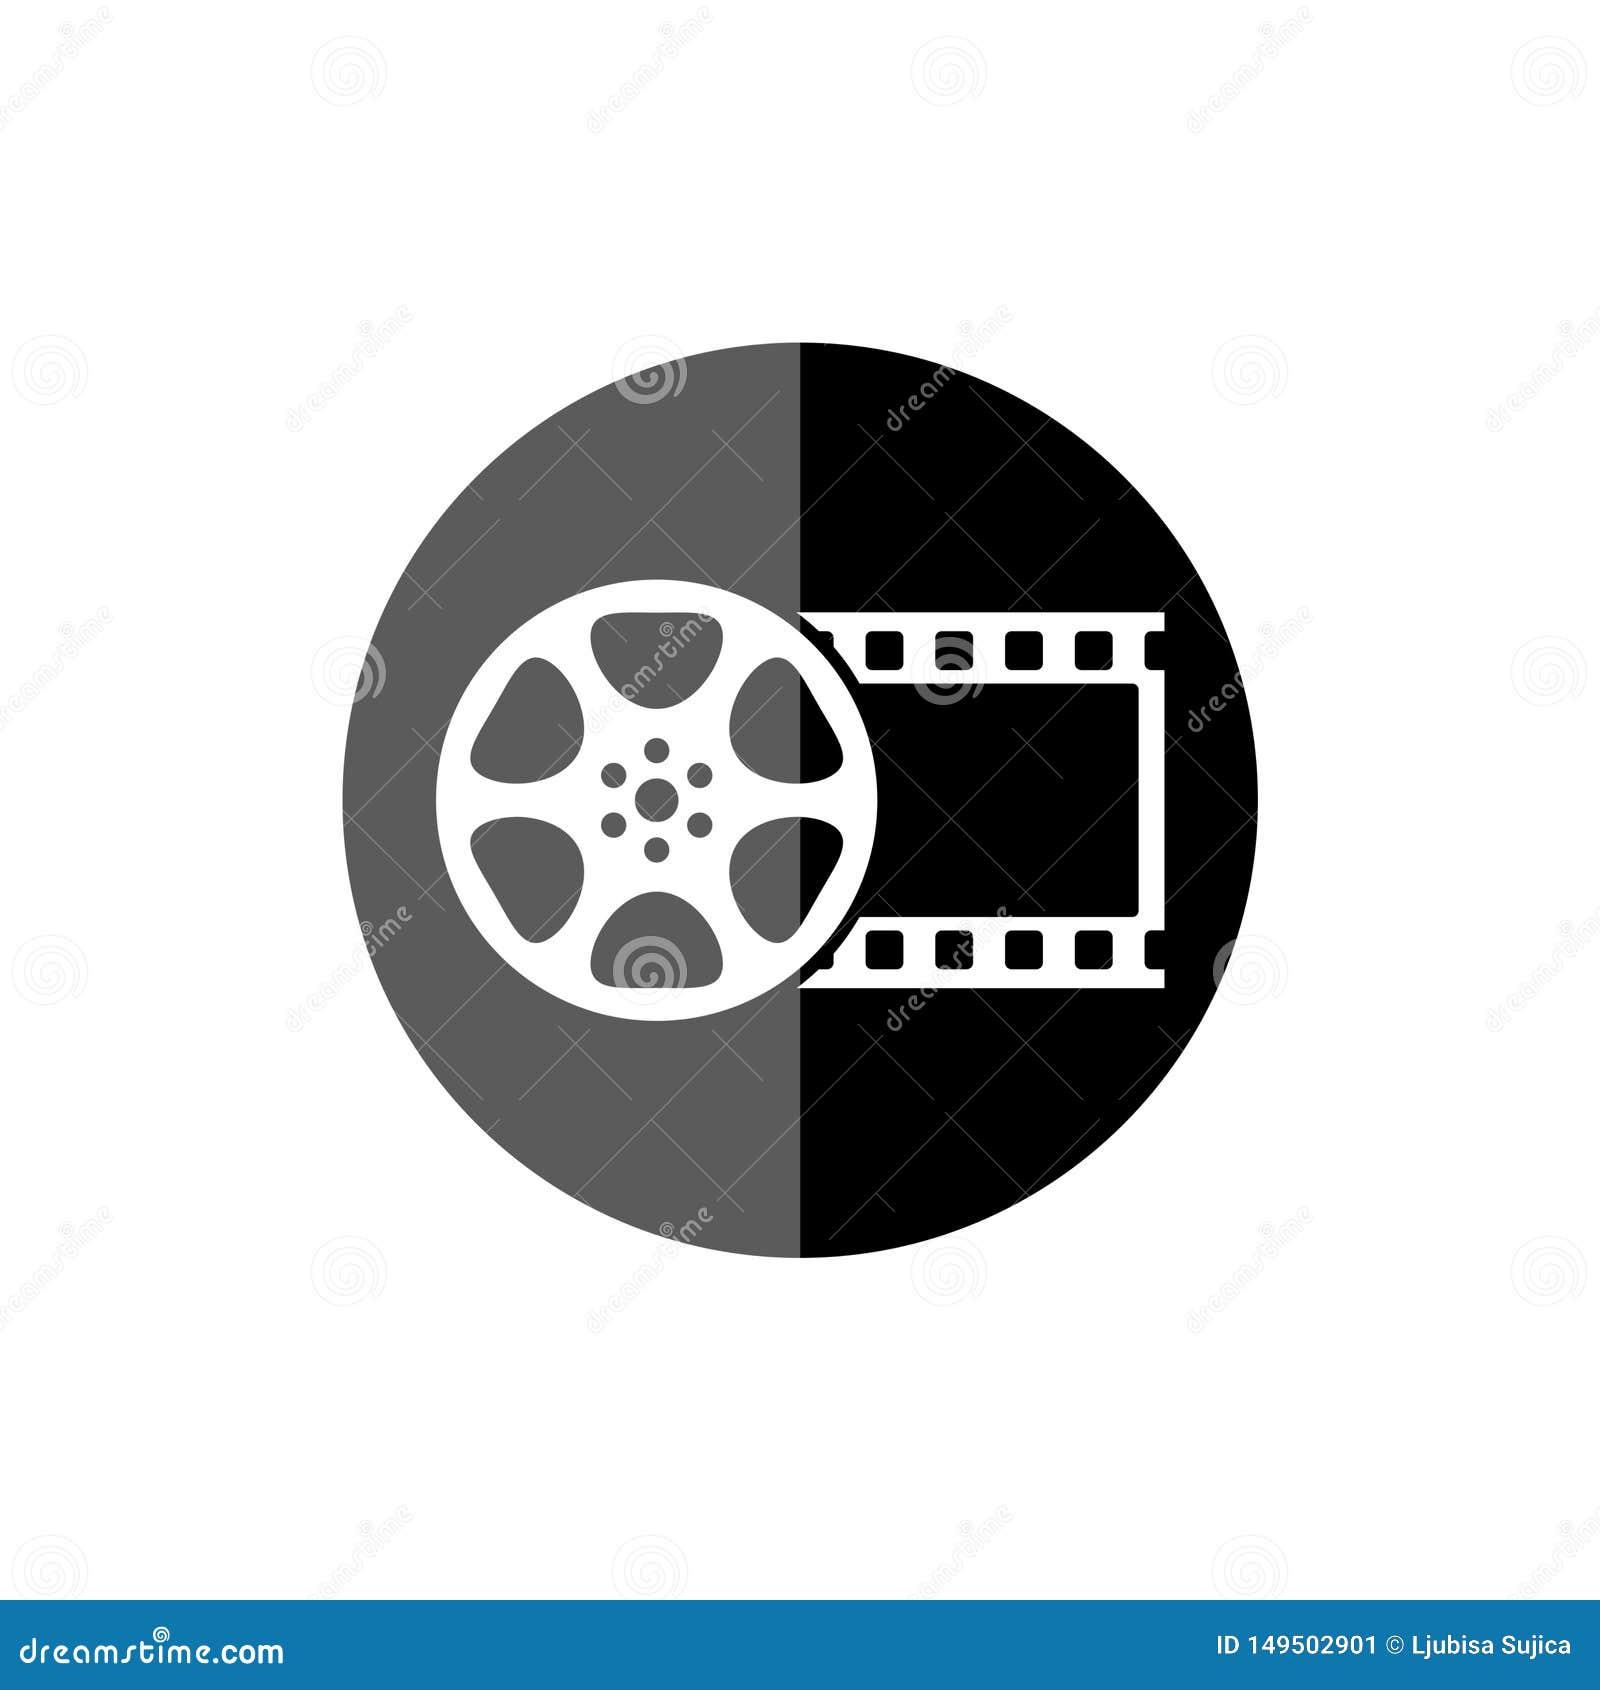 Film reel movie, The video icon, Movie symbol